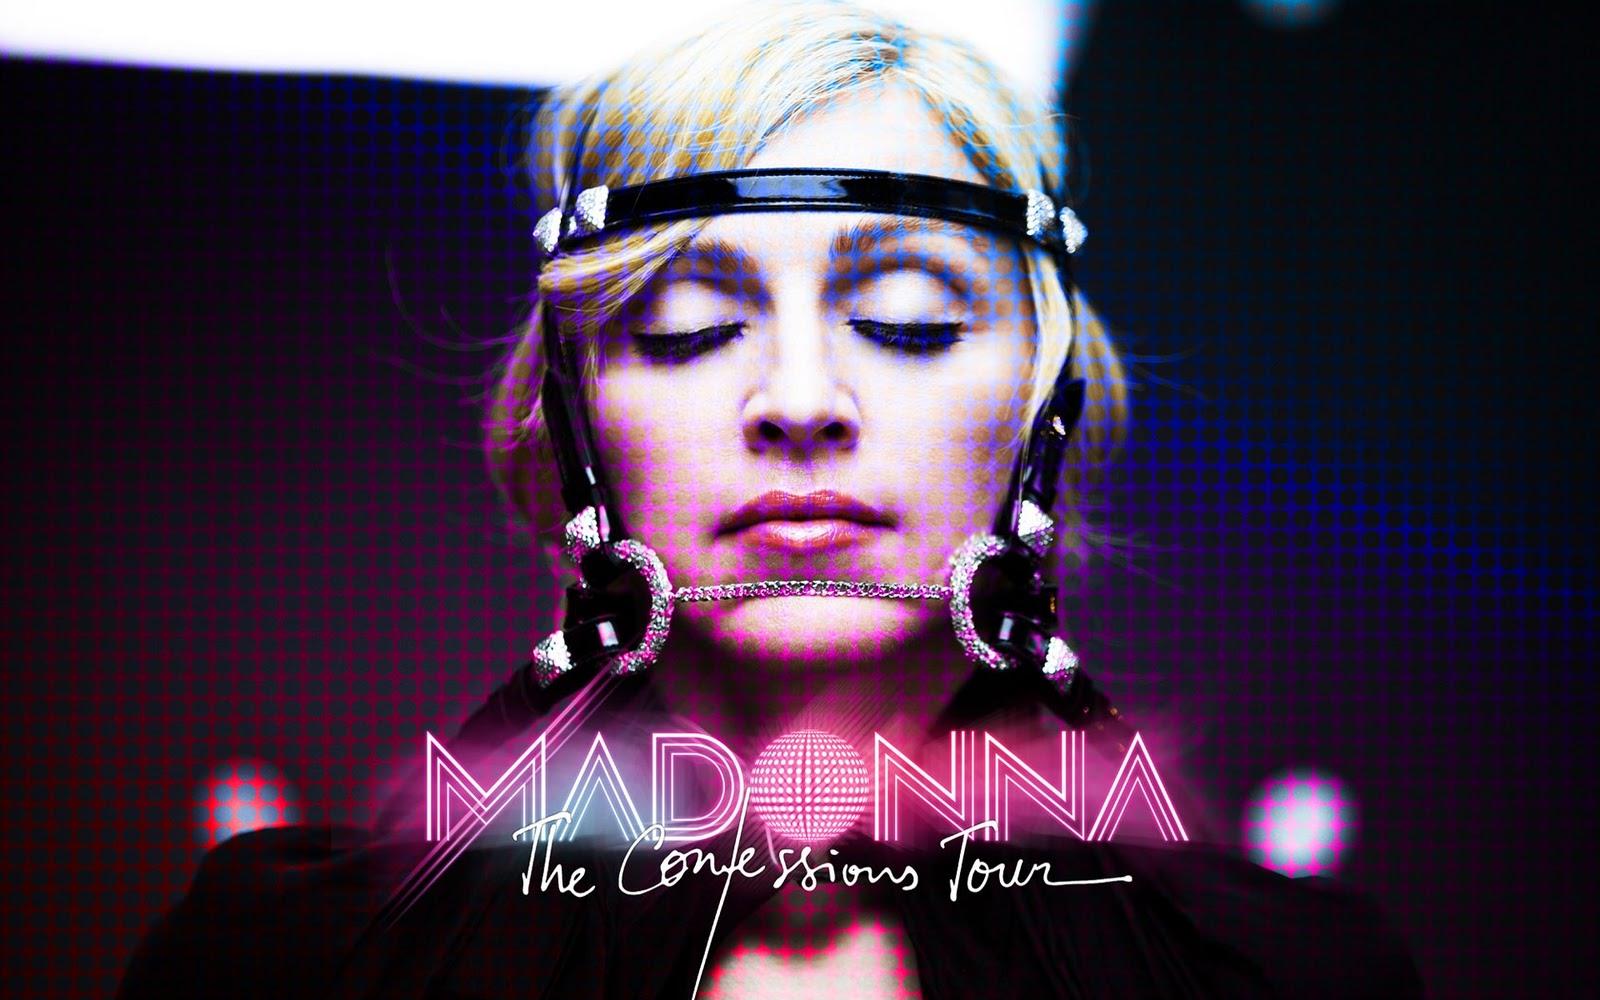 Madonna, The Confessions Tour, graphics.